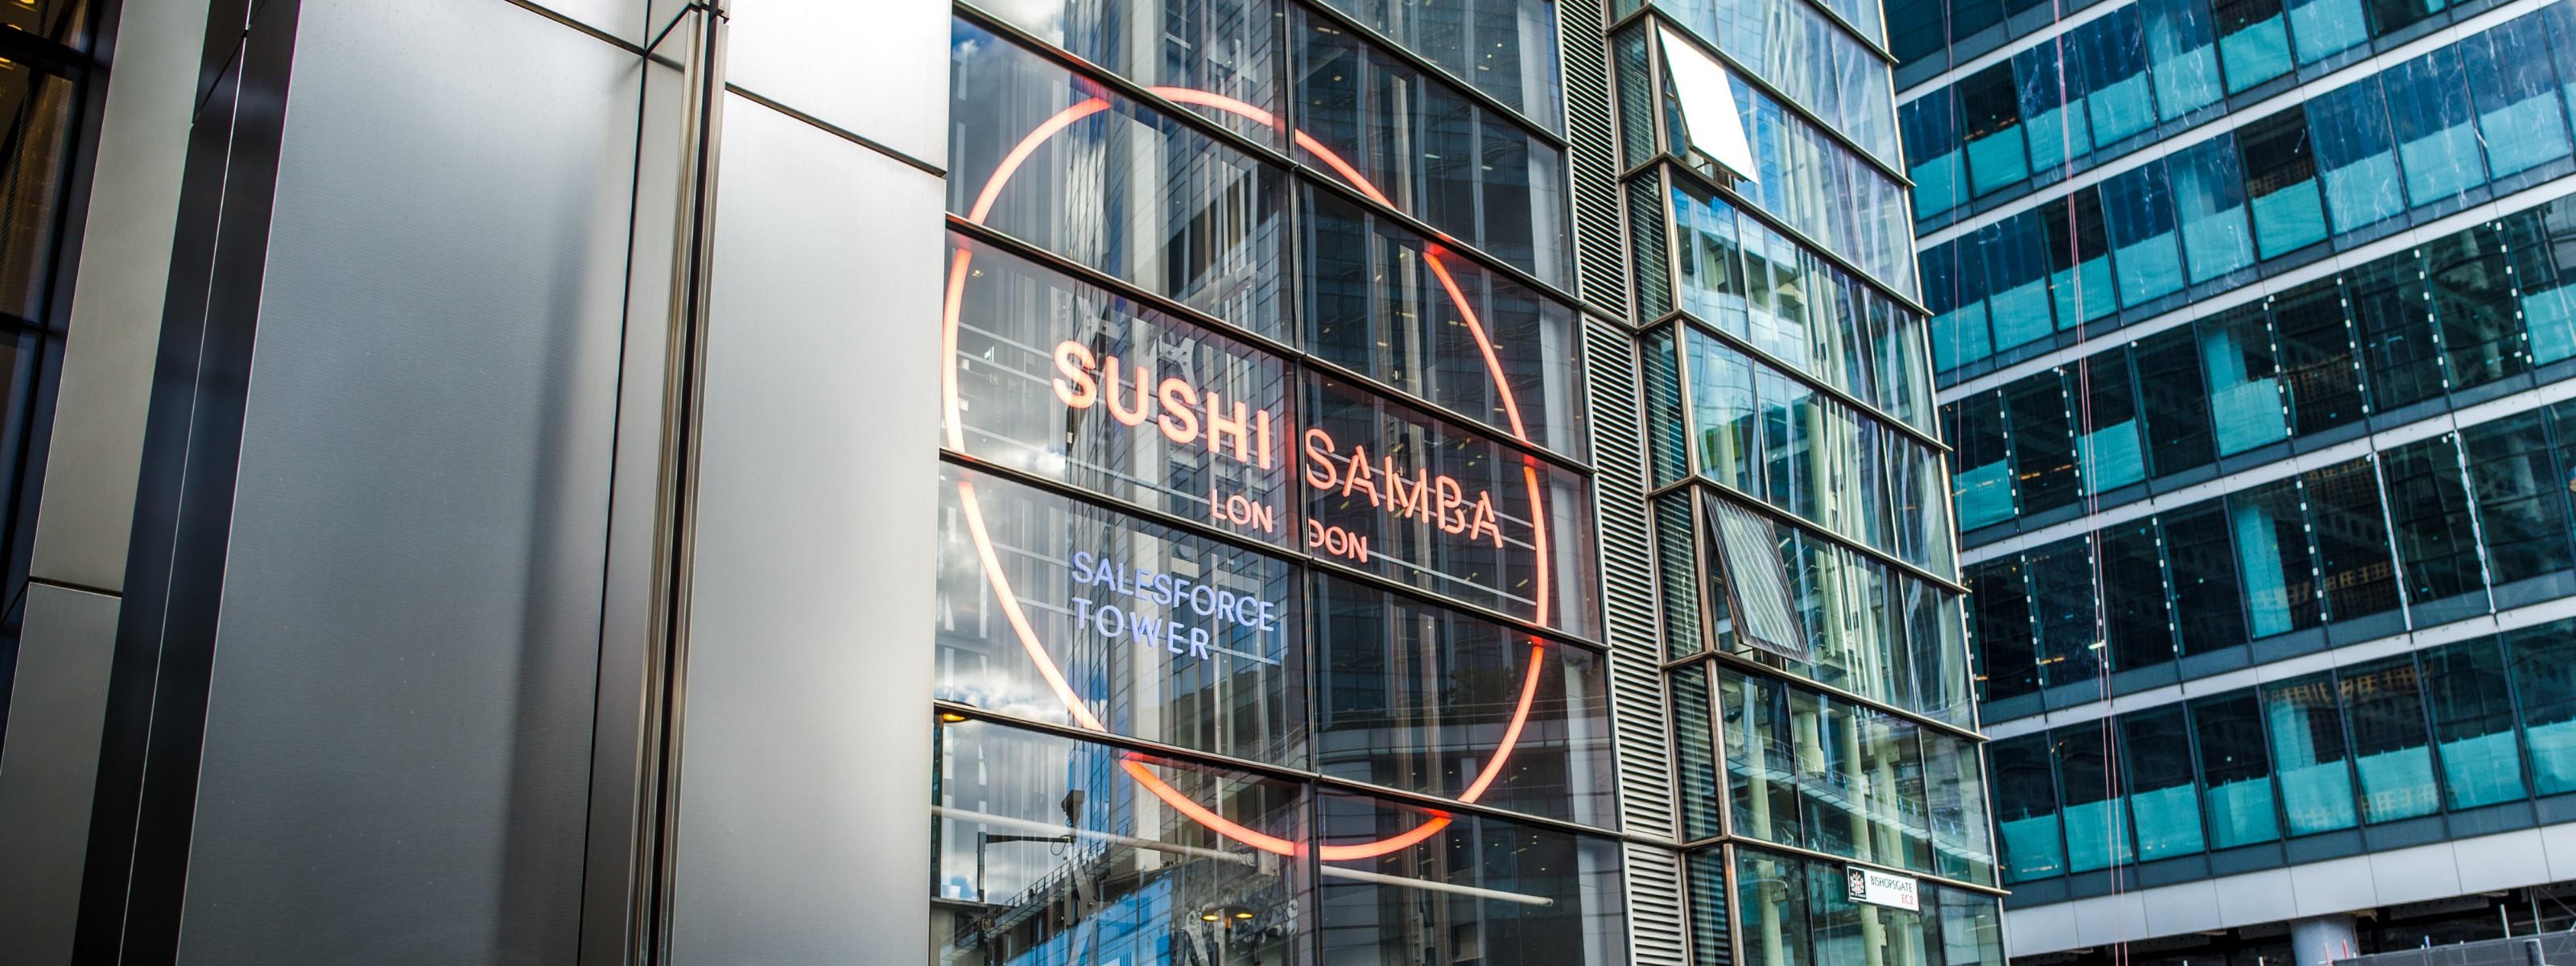 Shushisamba for hire